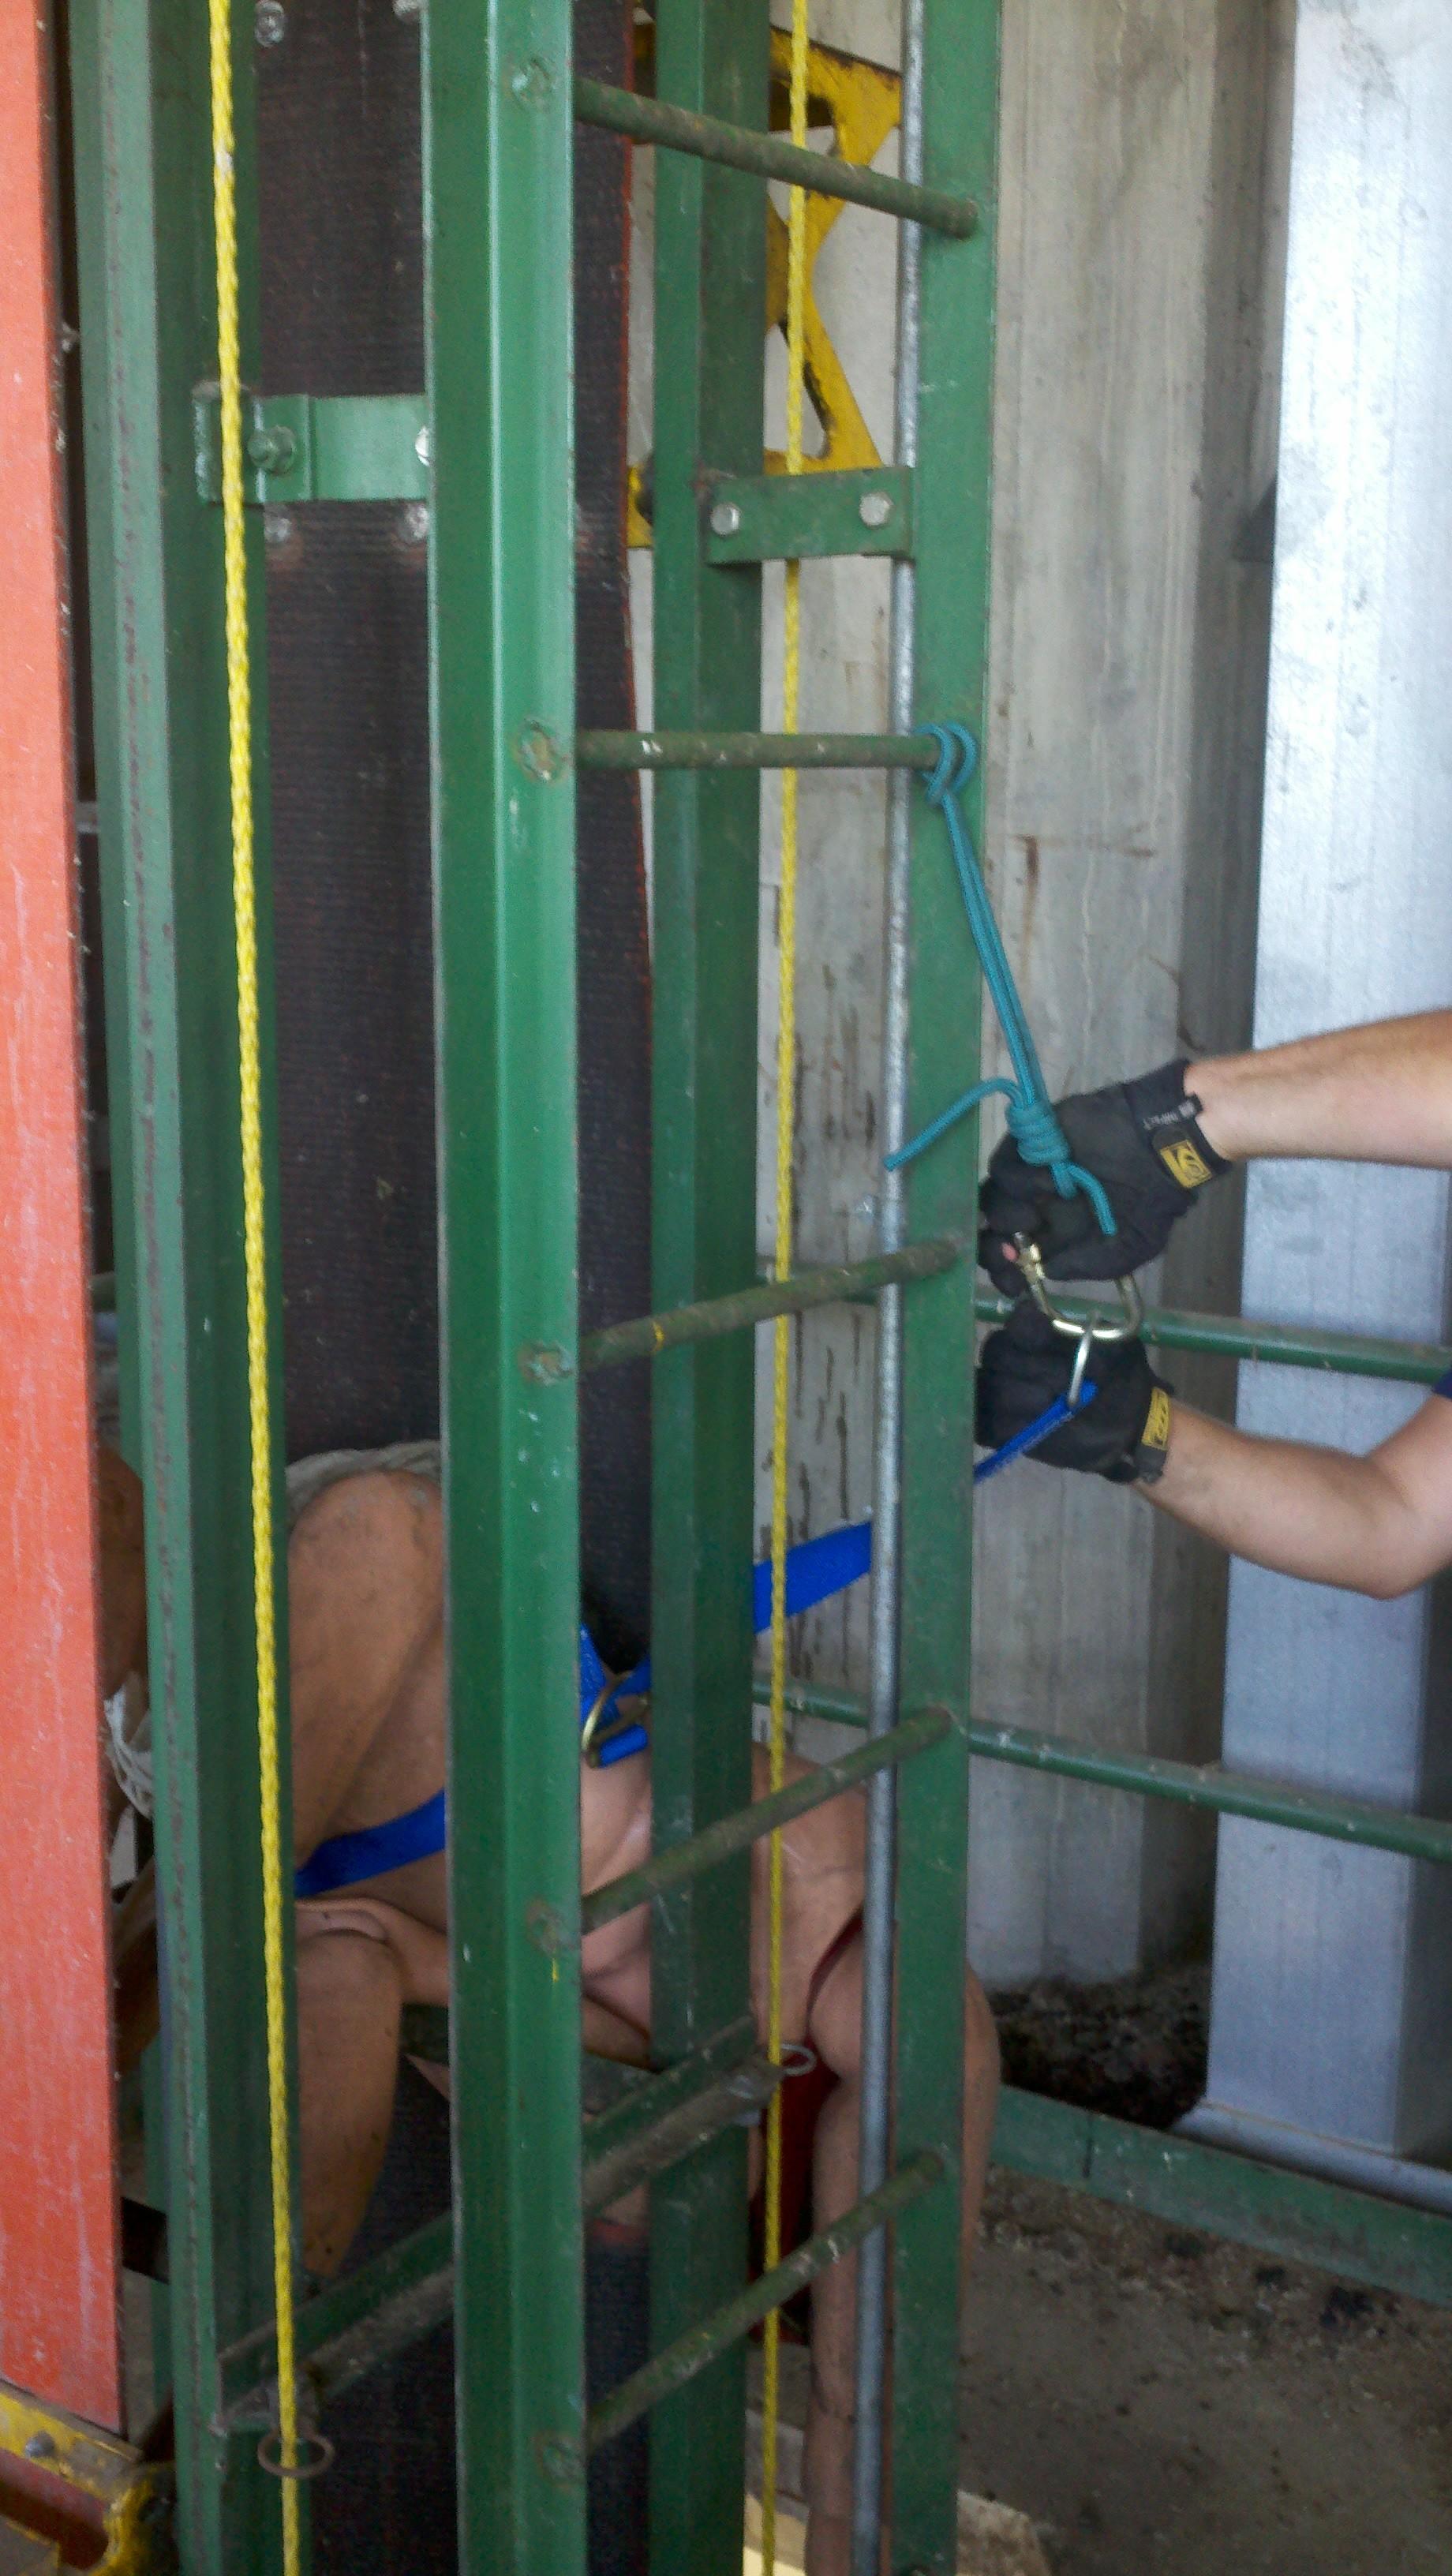 Hasty Harness Firefighter Firefighter Seal Elsavadorla